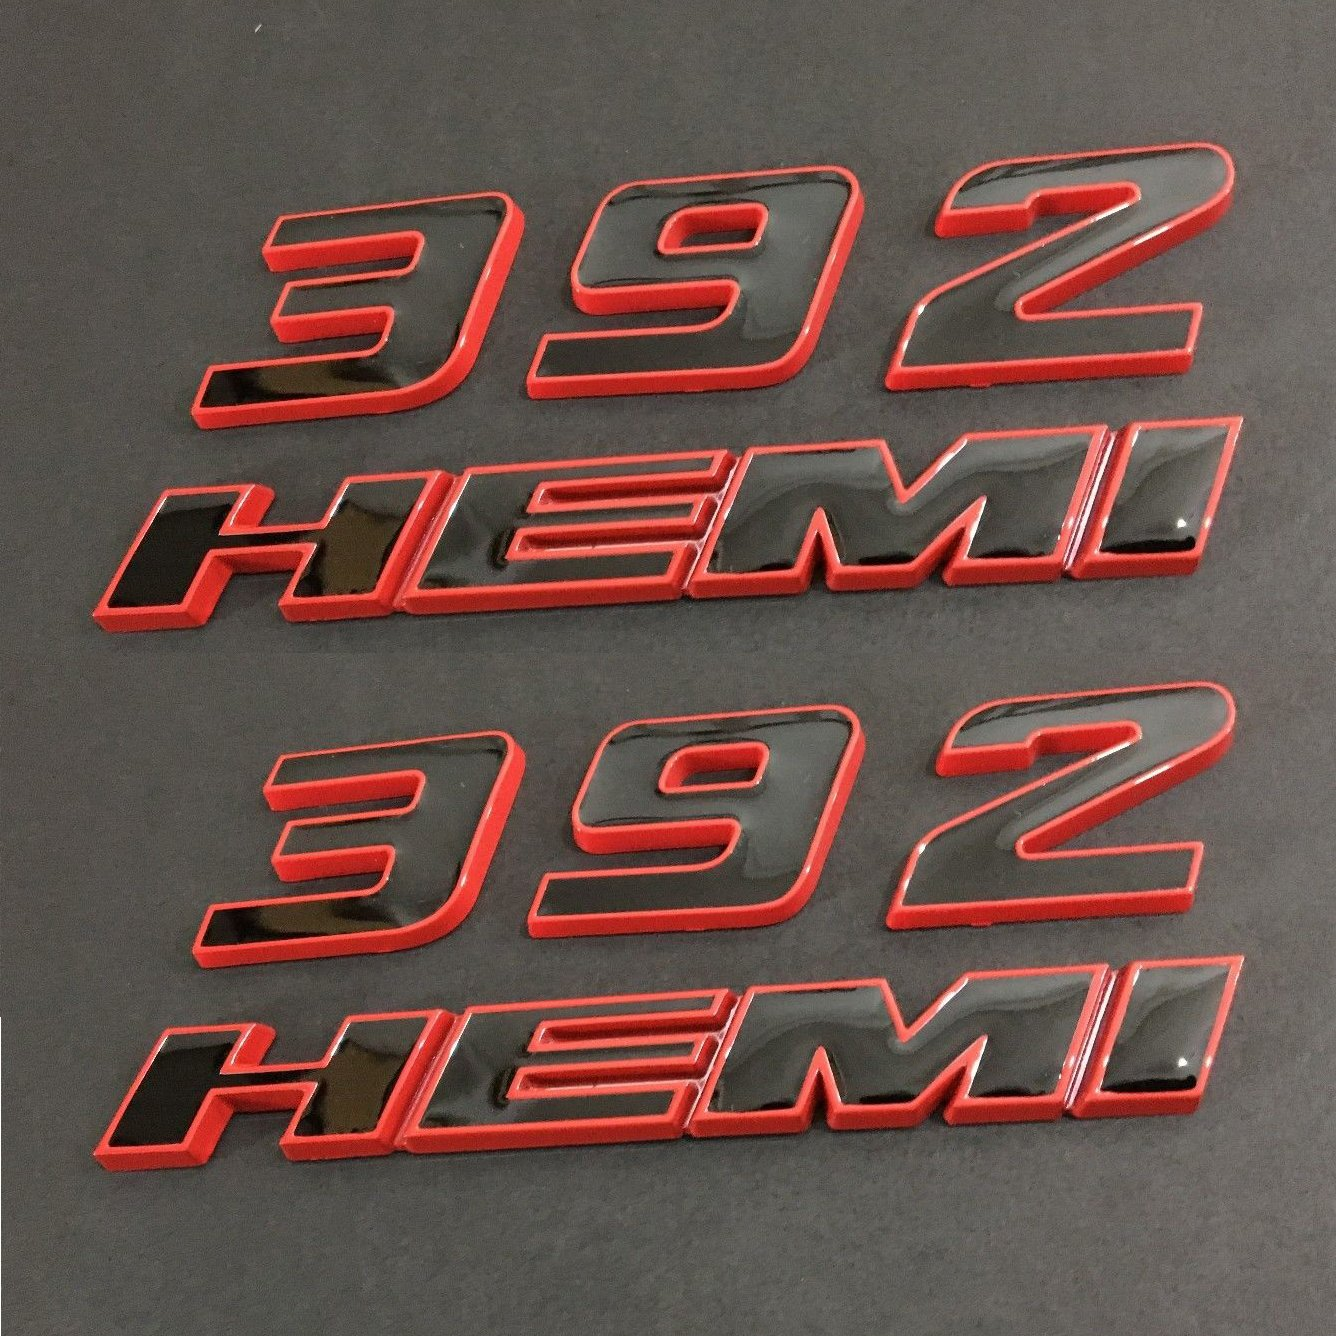 Yoaoo 2pcs OEM 392 HEMI Emblem 392Hemi Badge 3D for Dodge Challenger Red Frame